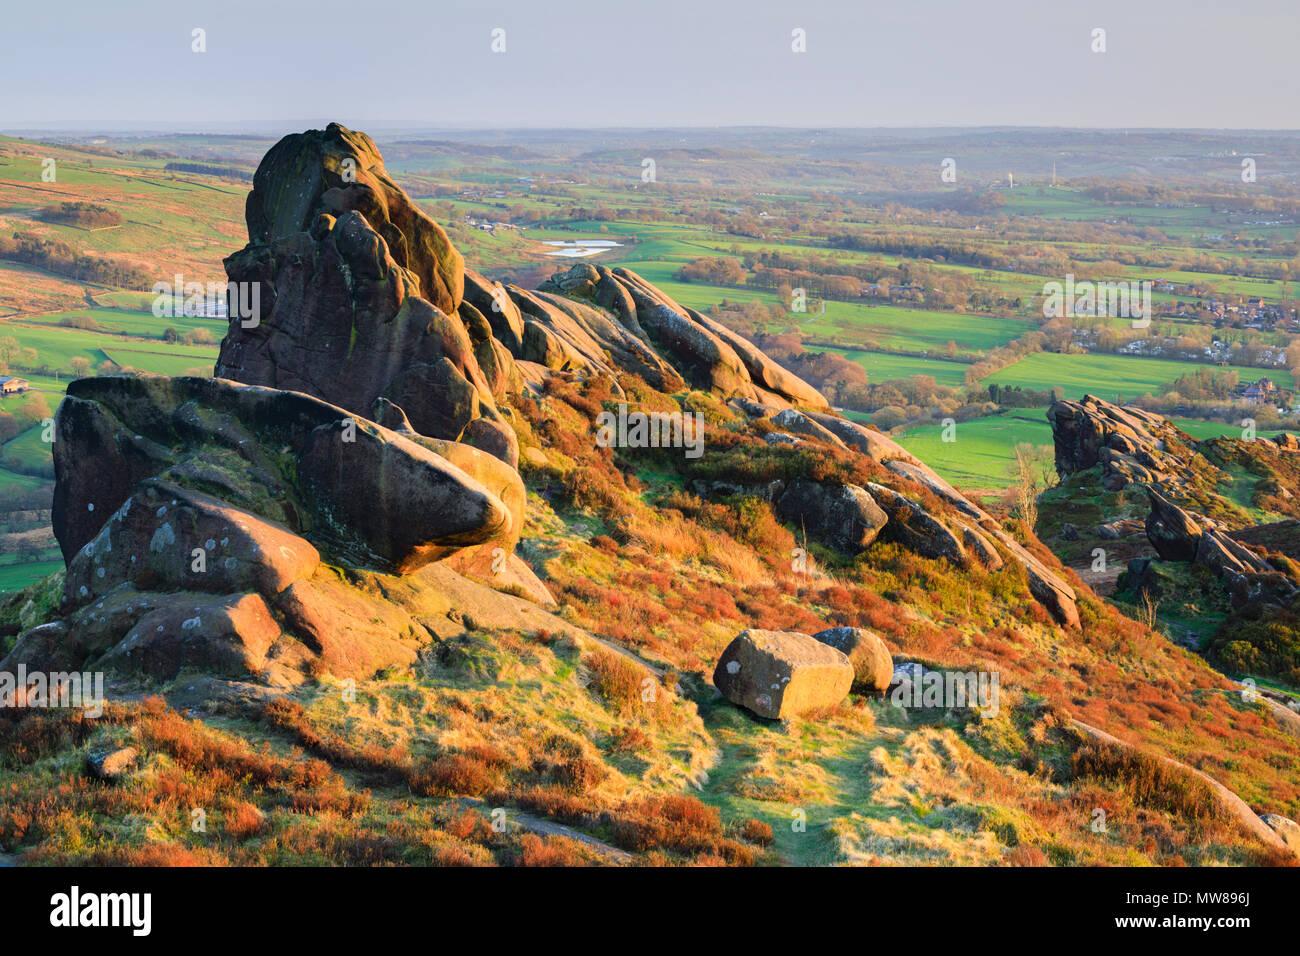 Ramshaw Rocks in the Peak District National Park. - Stock Image